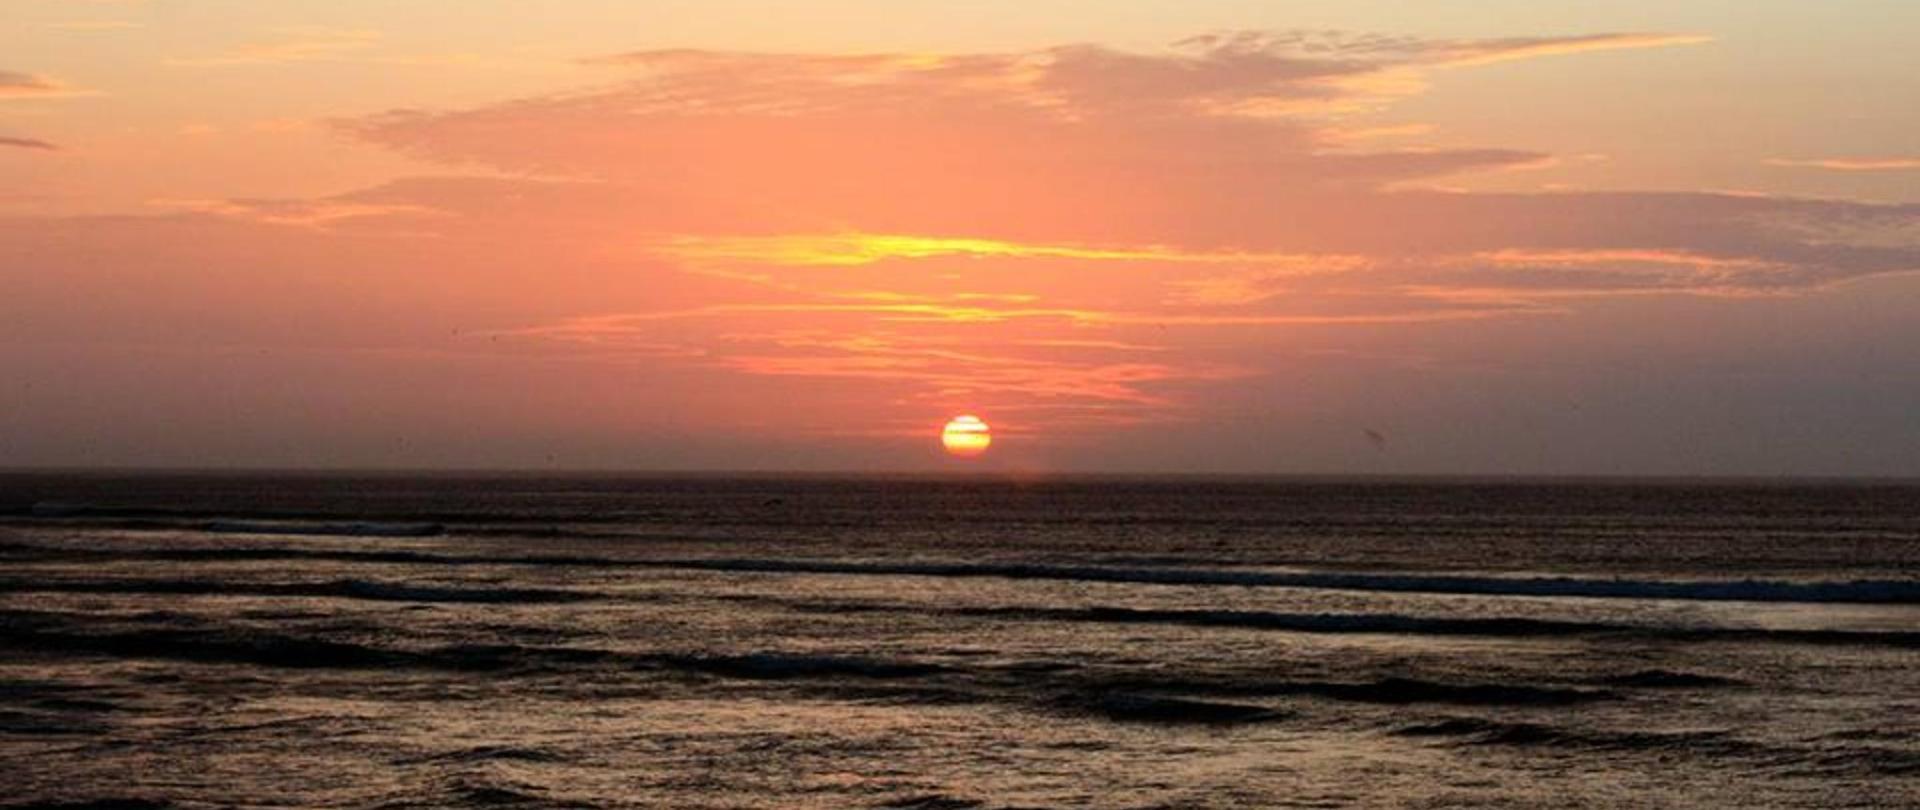 Surf Hotel Hospedaje El Mirador Pacasmayo Peru sunset 2.jpg